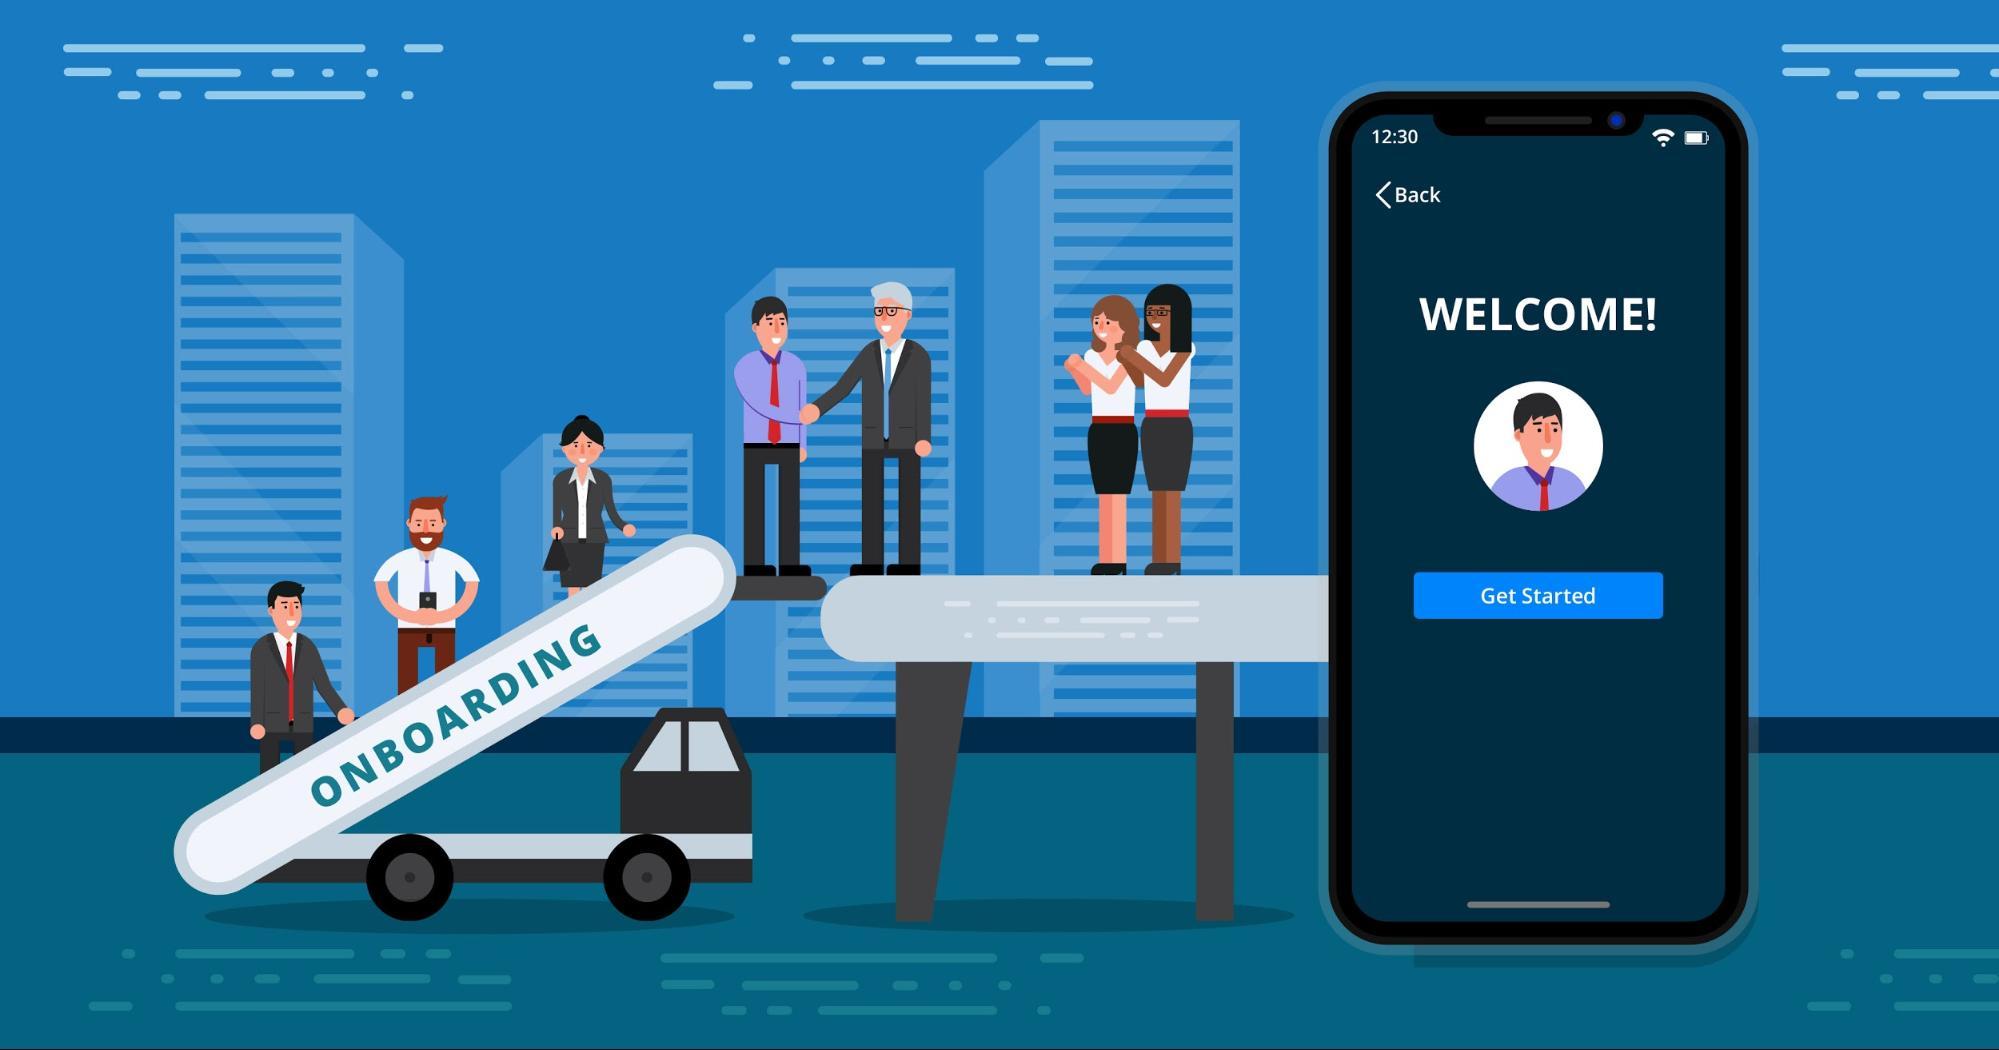 Ux Amp User Onboarding In Mobile Apps Mobile Jazz Blog